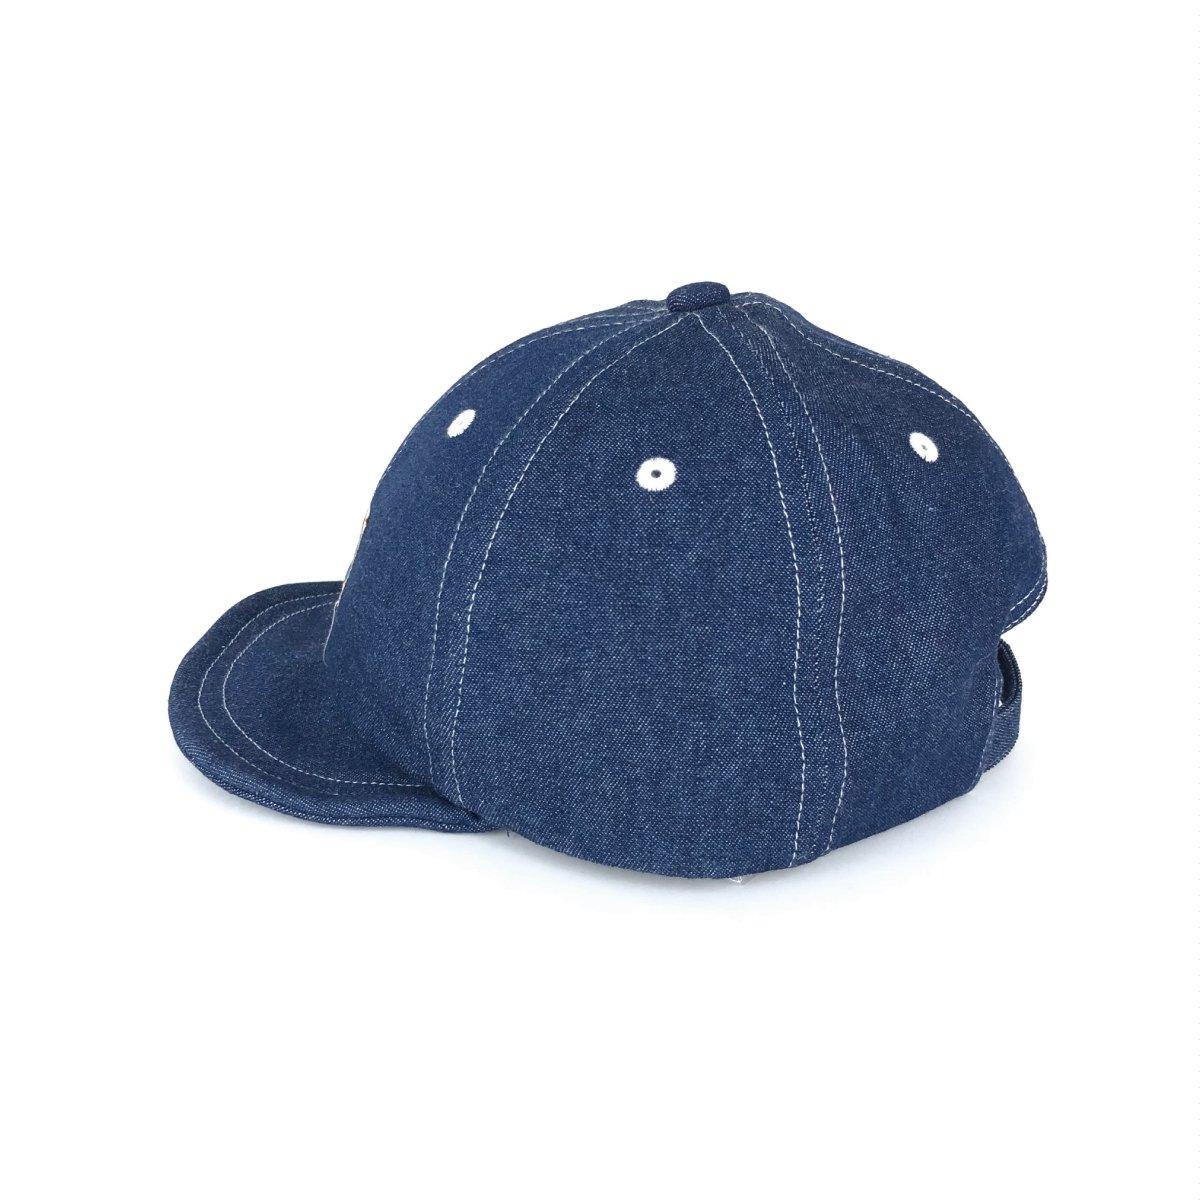 【KIDS】Public Cap 詳細画像11